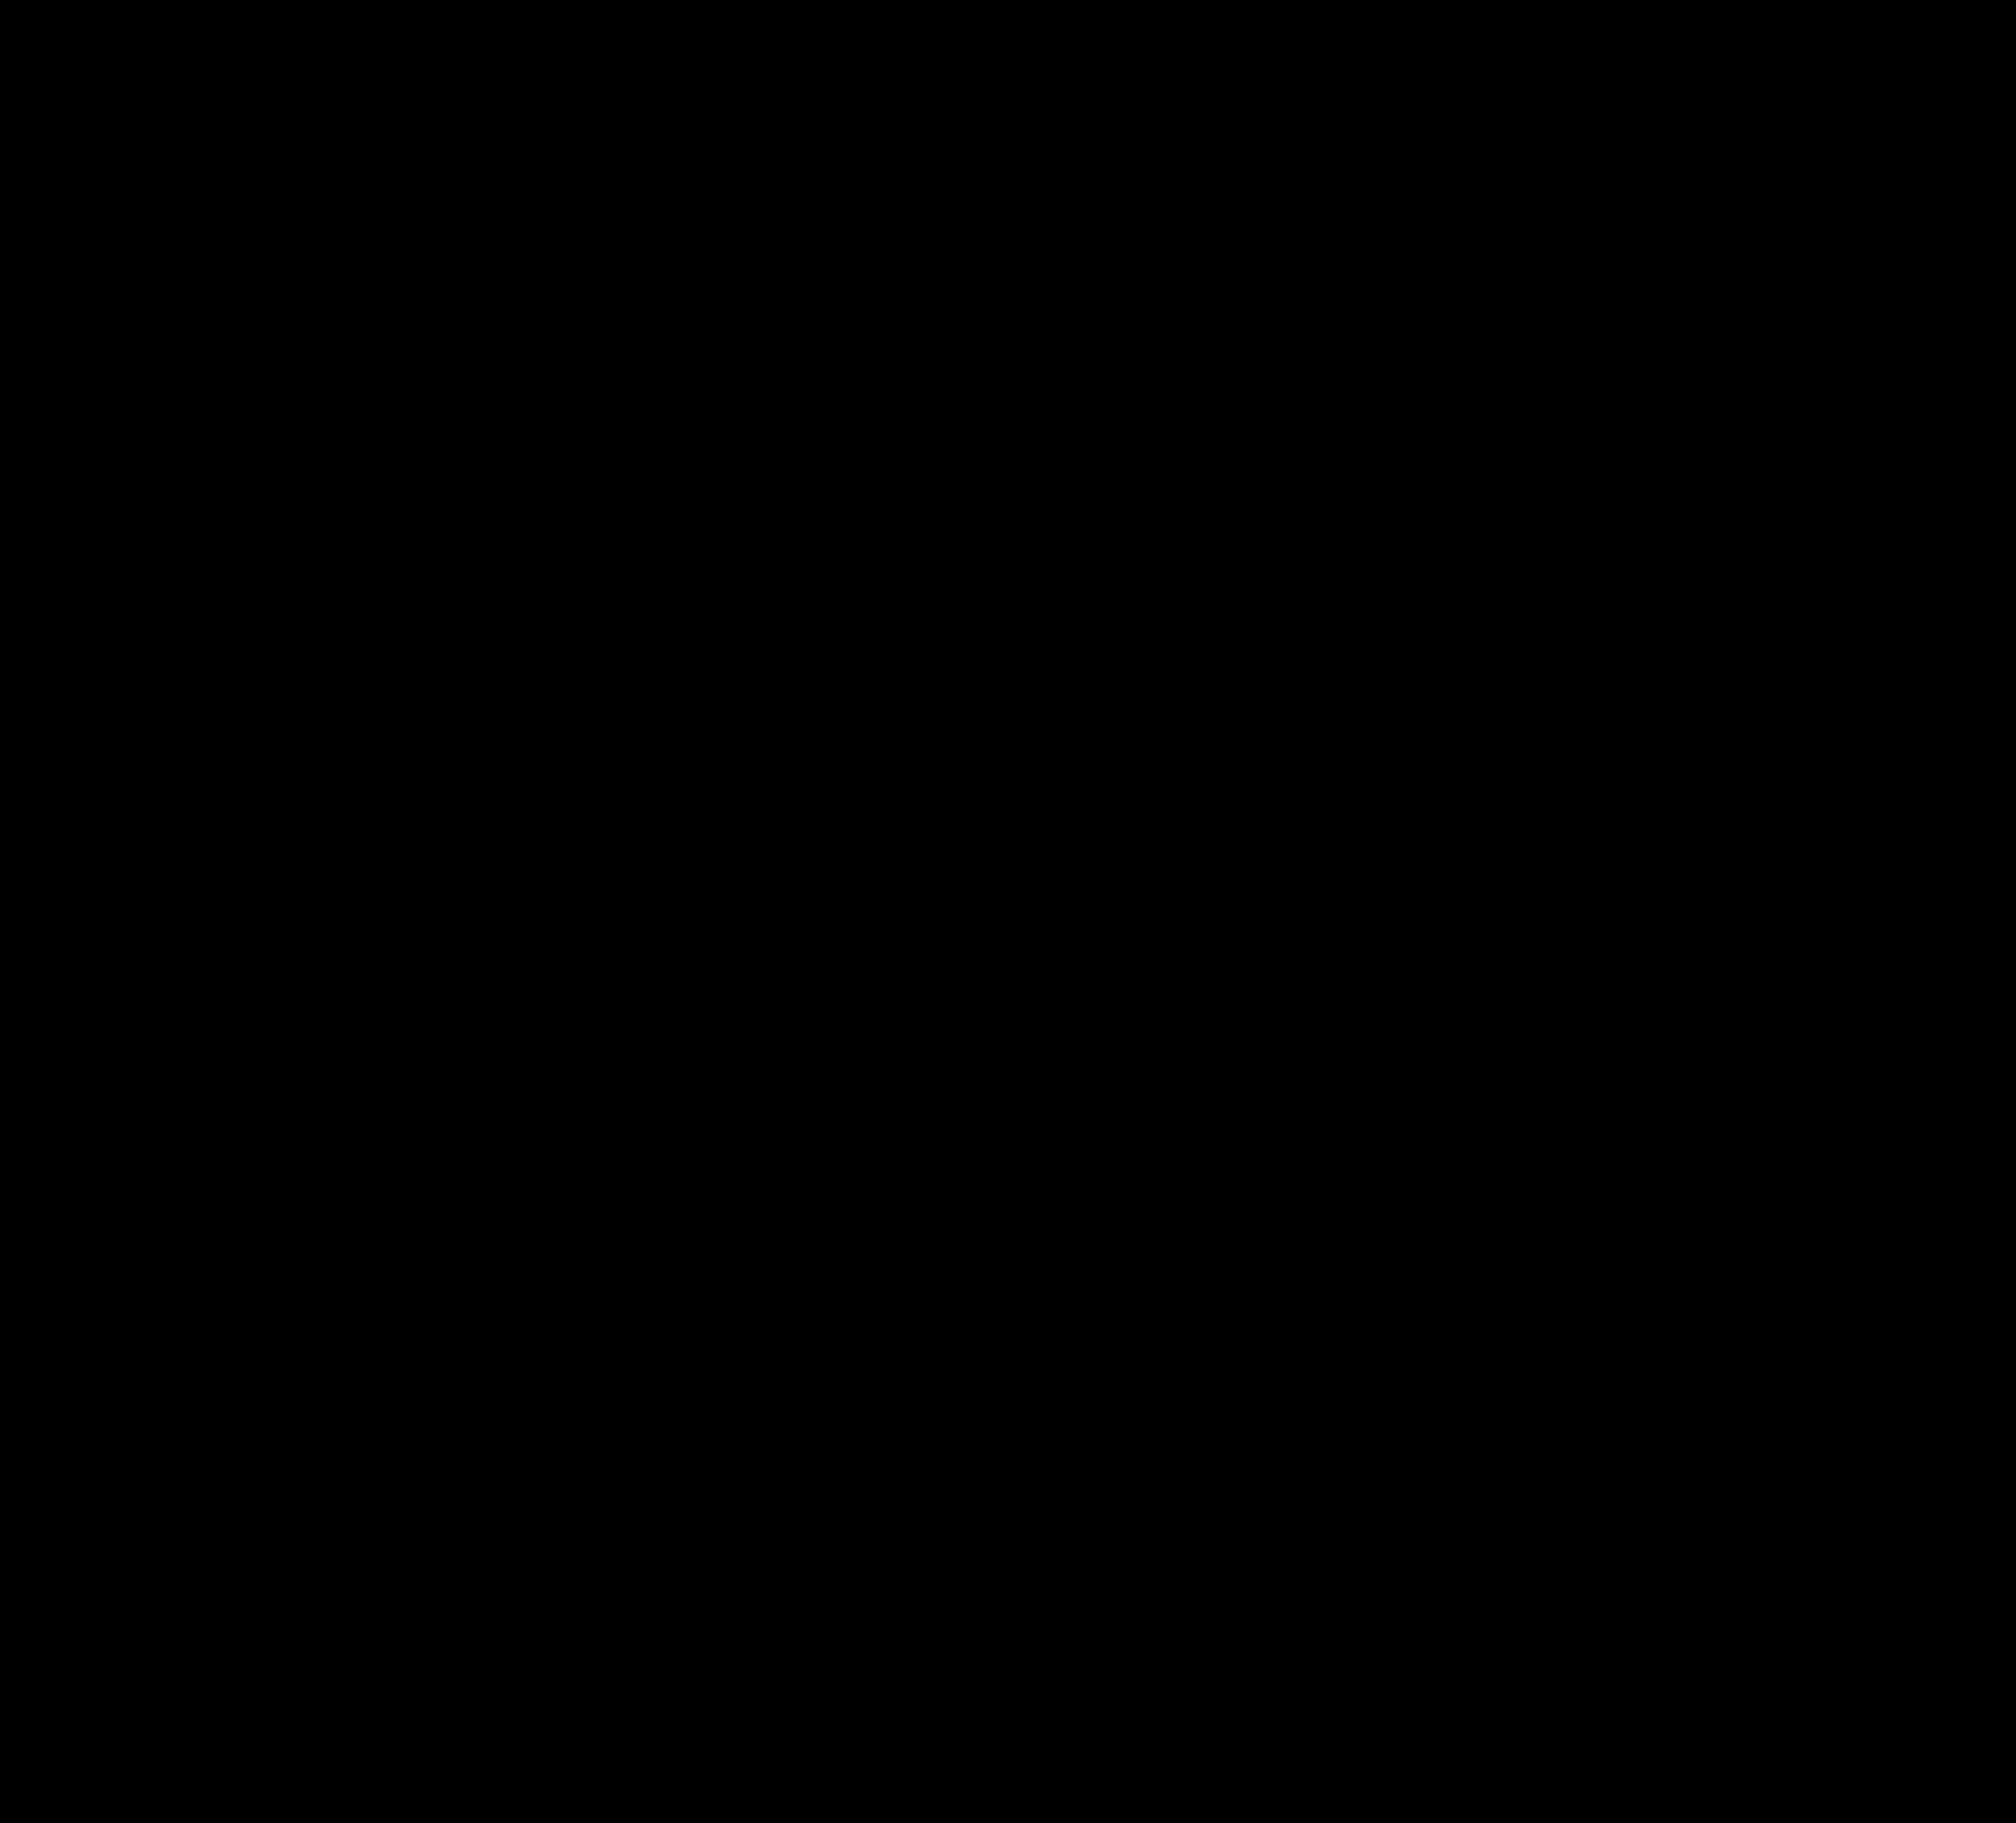 clip art black and white stock Taekwondo clipart. Clip art best catherine